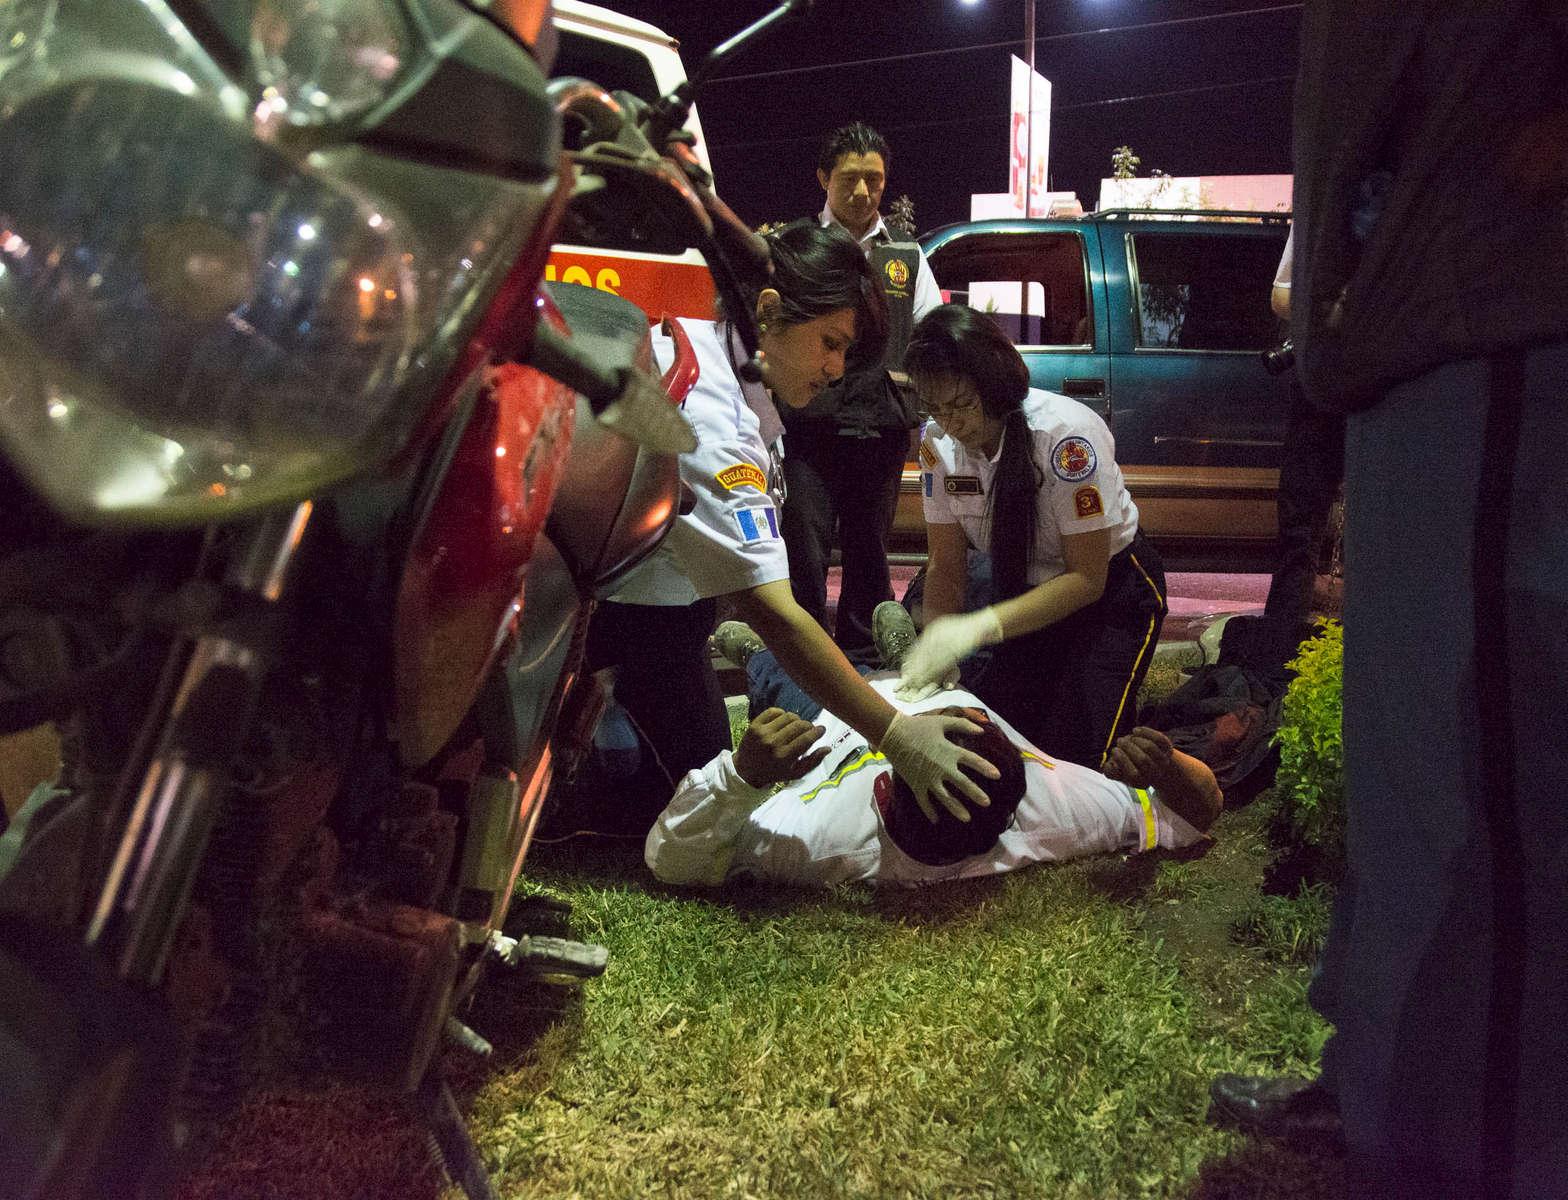 Guatemala City Cuerpo Voluntario de BomberosEstacion CentralPhotograph by Brian R. Page, brianpage.photoshelter.com